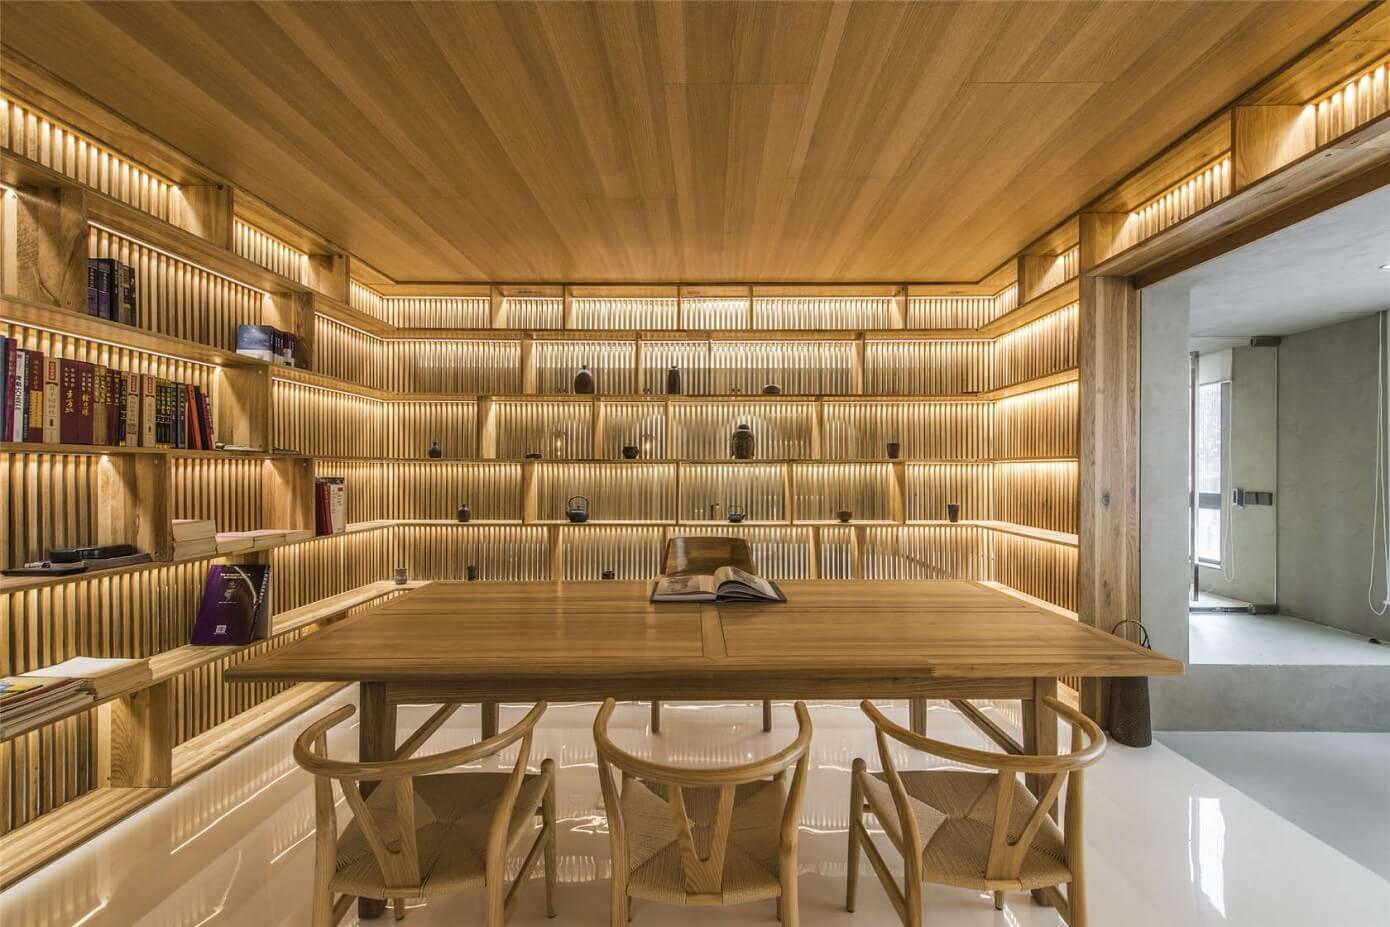 002 haitang villa arch studio homeadore - Villa de luxe minorque esteve estudio ...